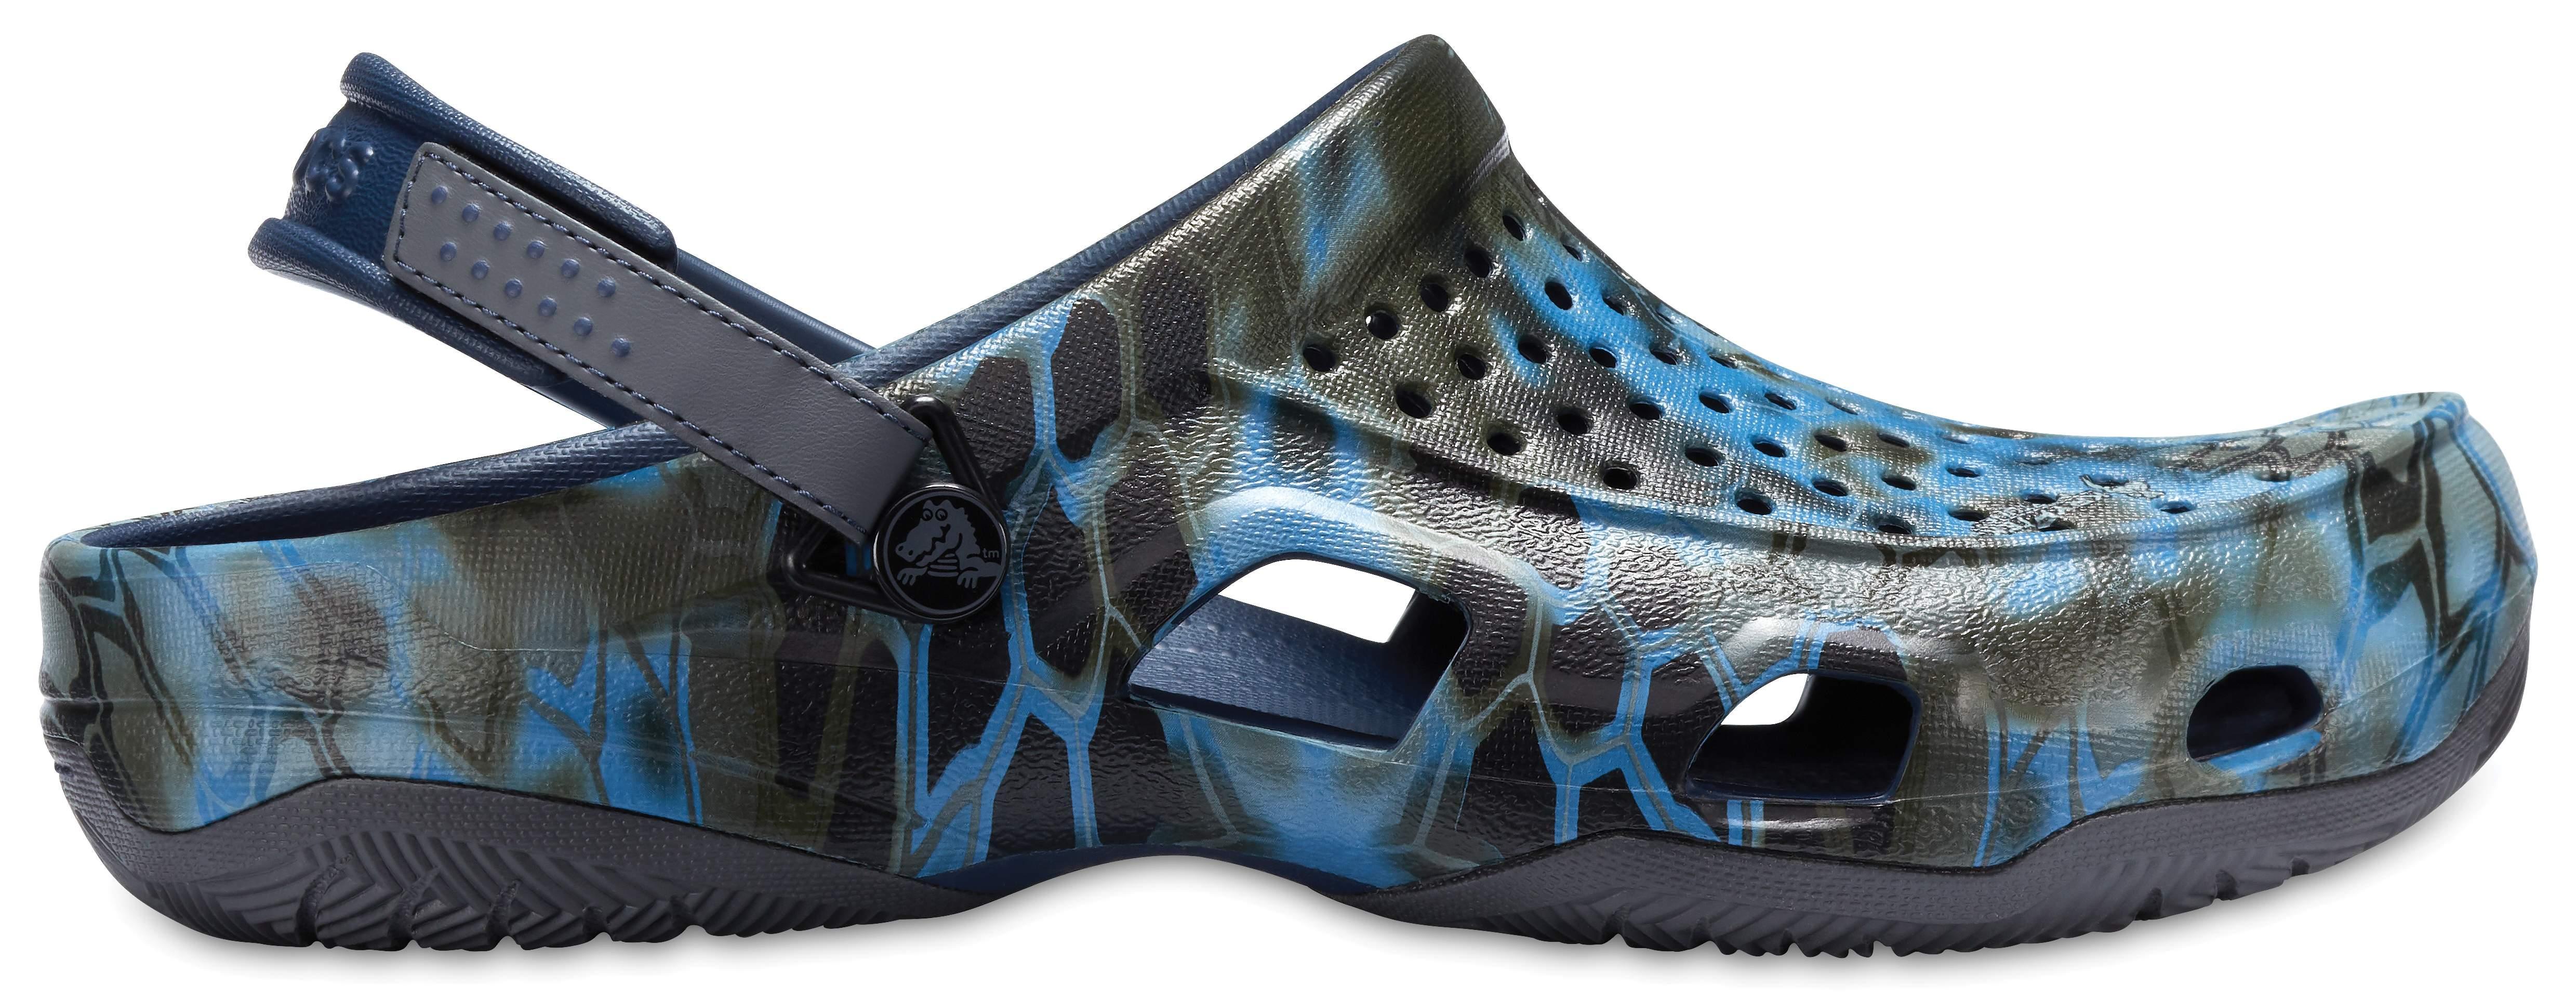 Crocs Swiftwater Kryptek® Neptune Deck Clog